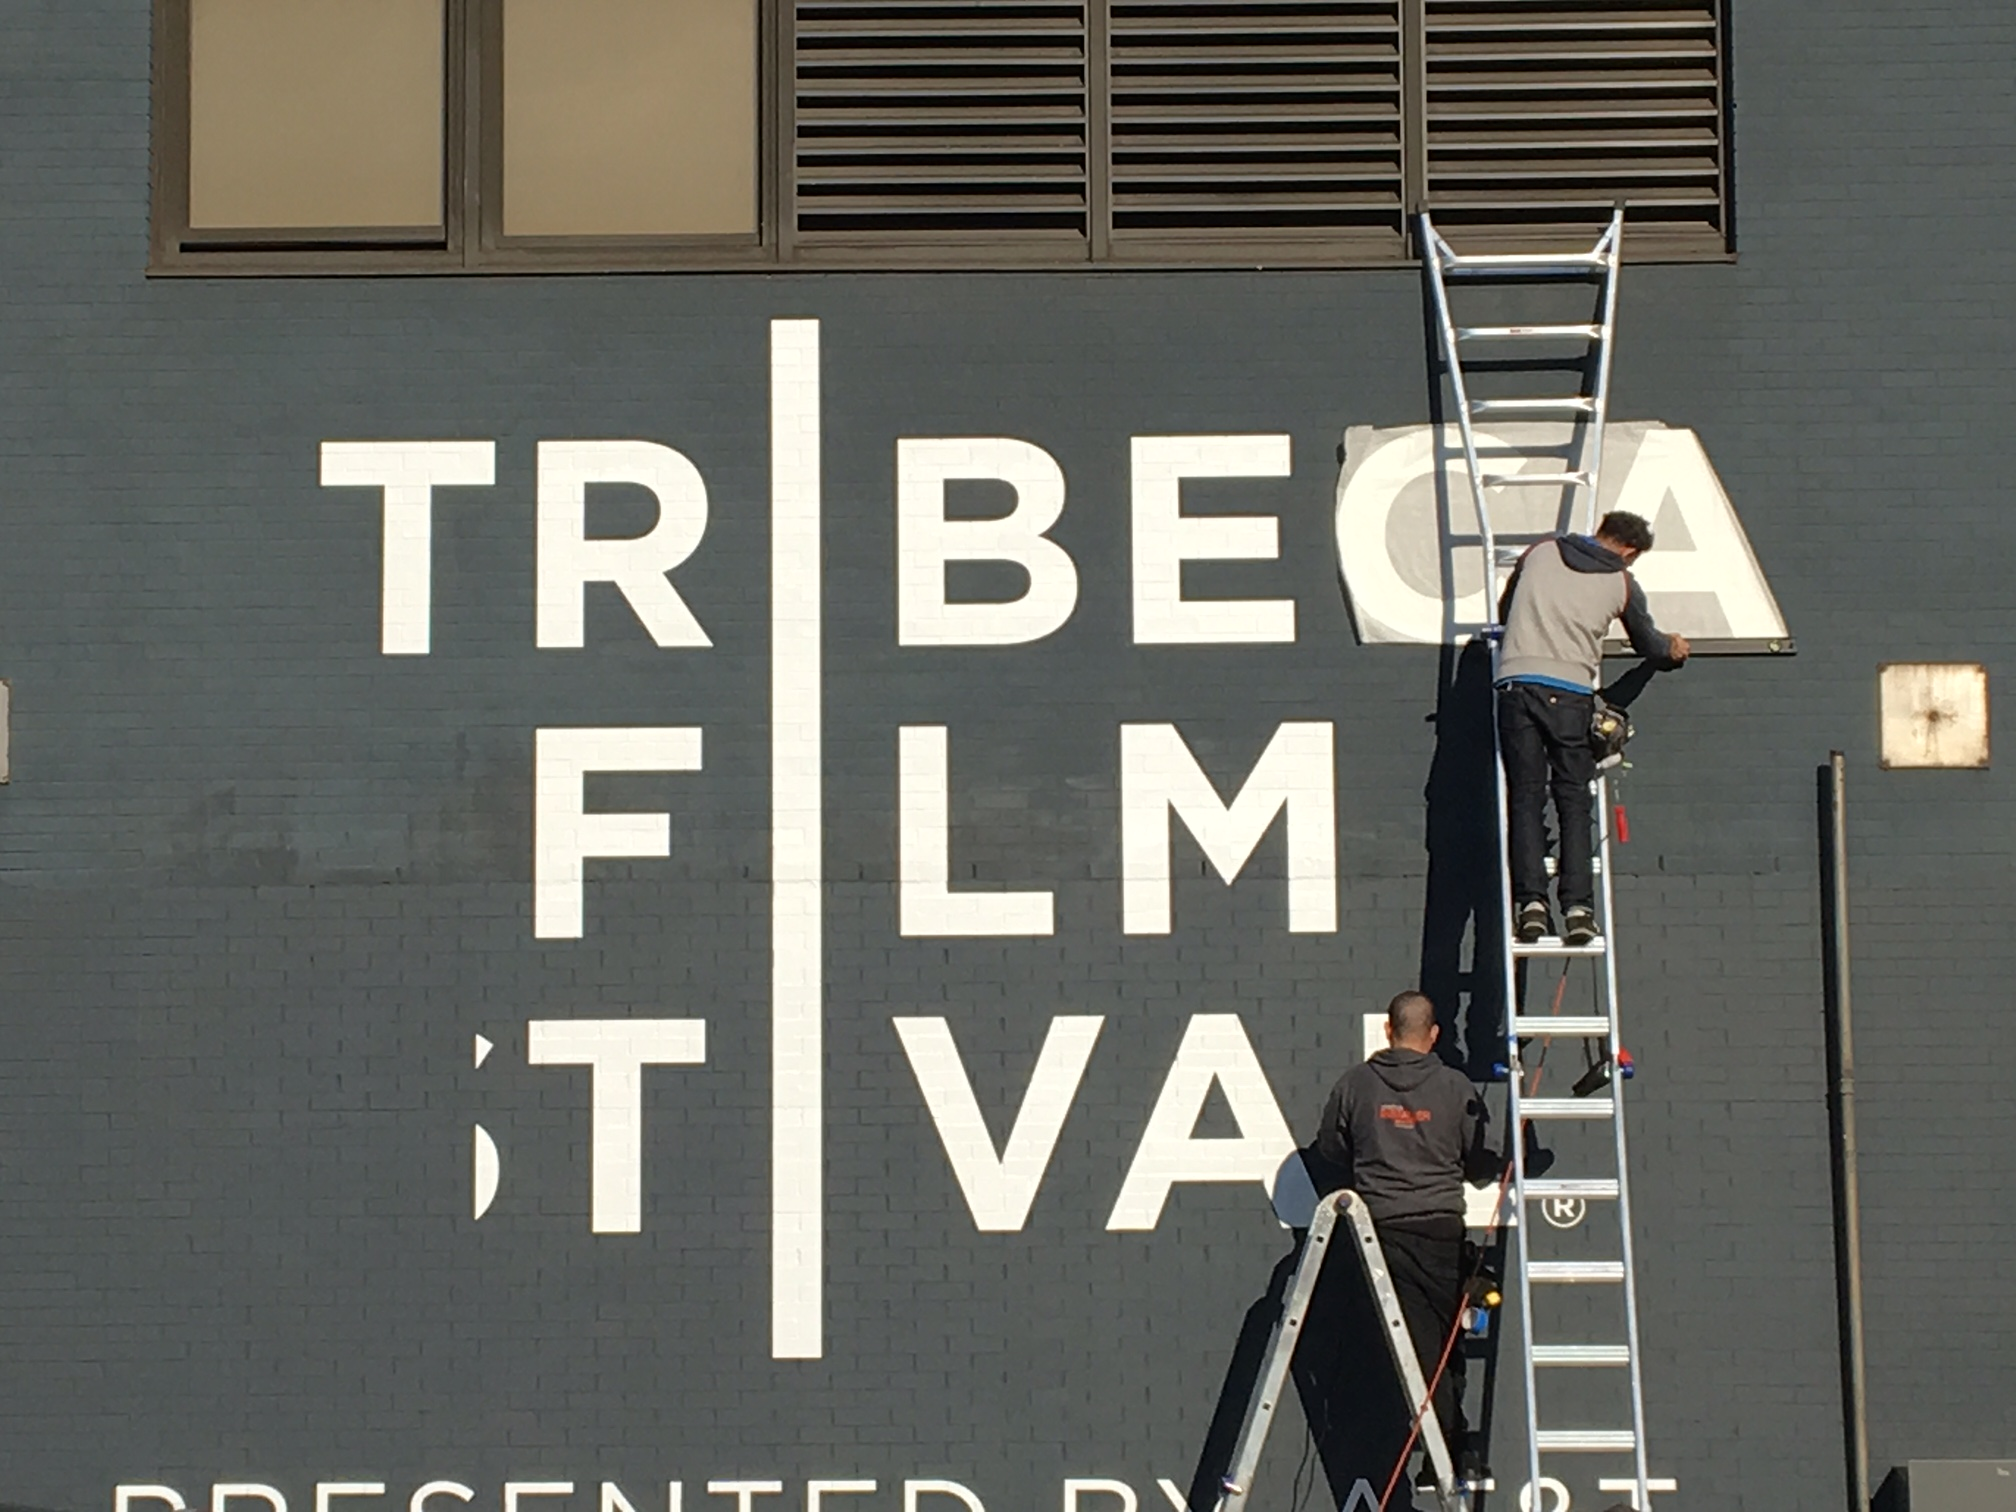 Tribeca Film Festival, Large Format, Print, Installation